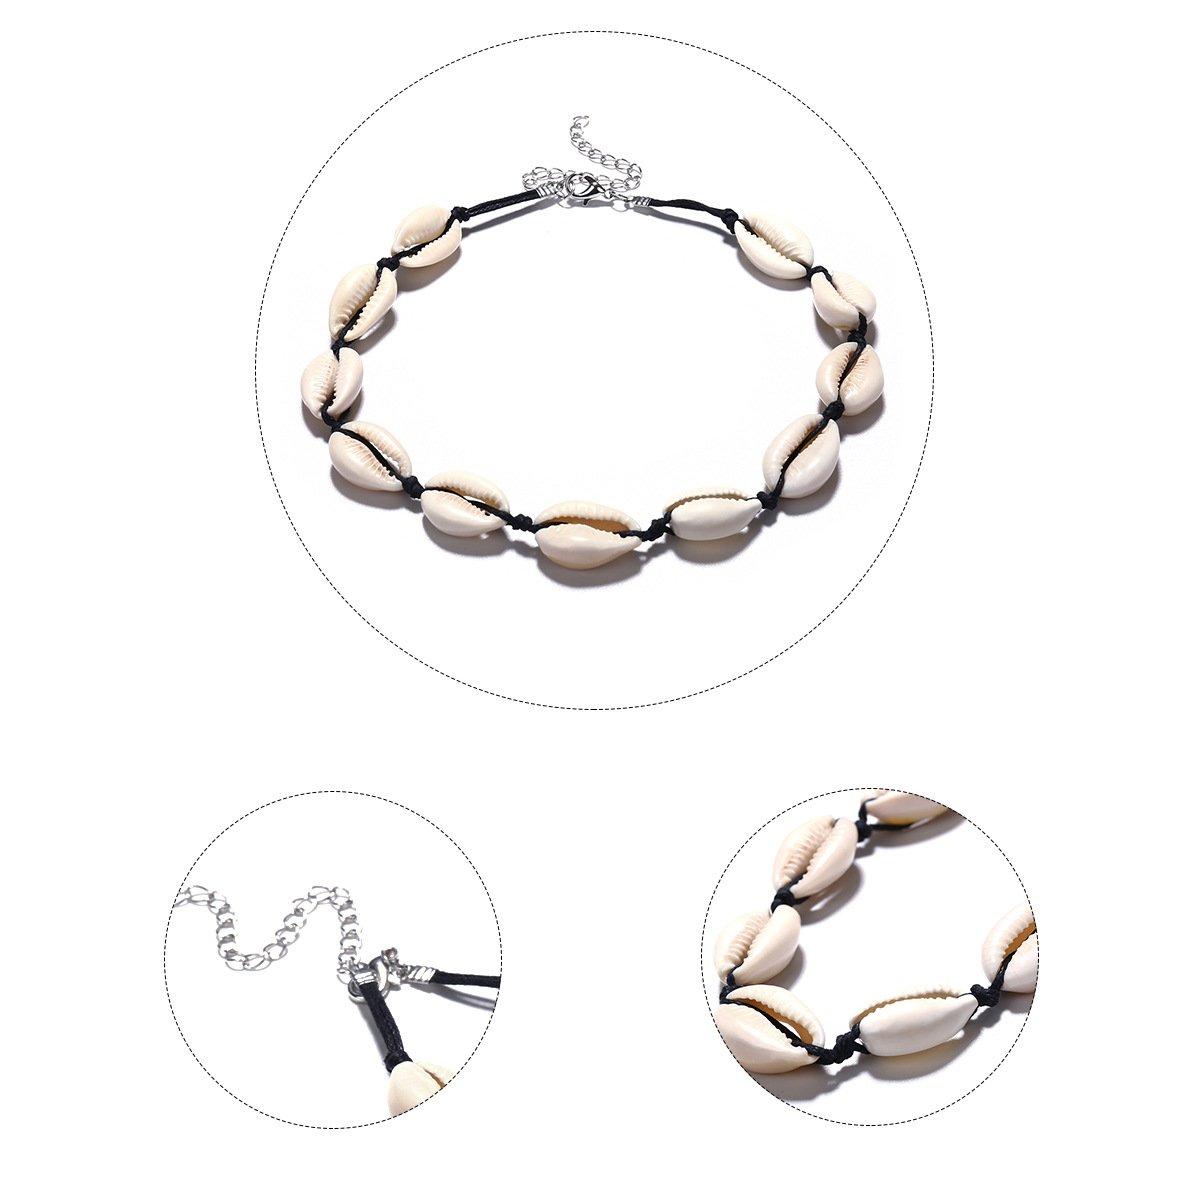 db0318a9c3b6 Collar bohemio de conchas de playa para mujer Yakiki H047-048